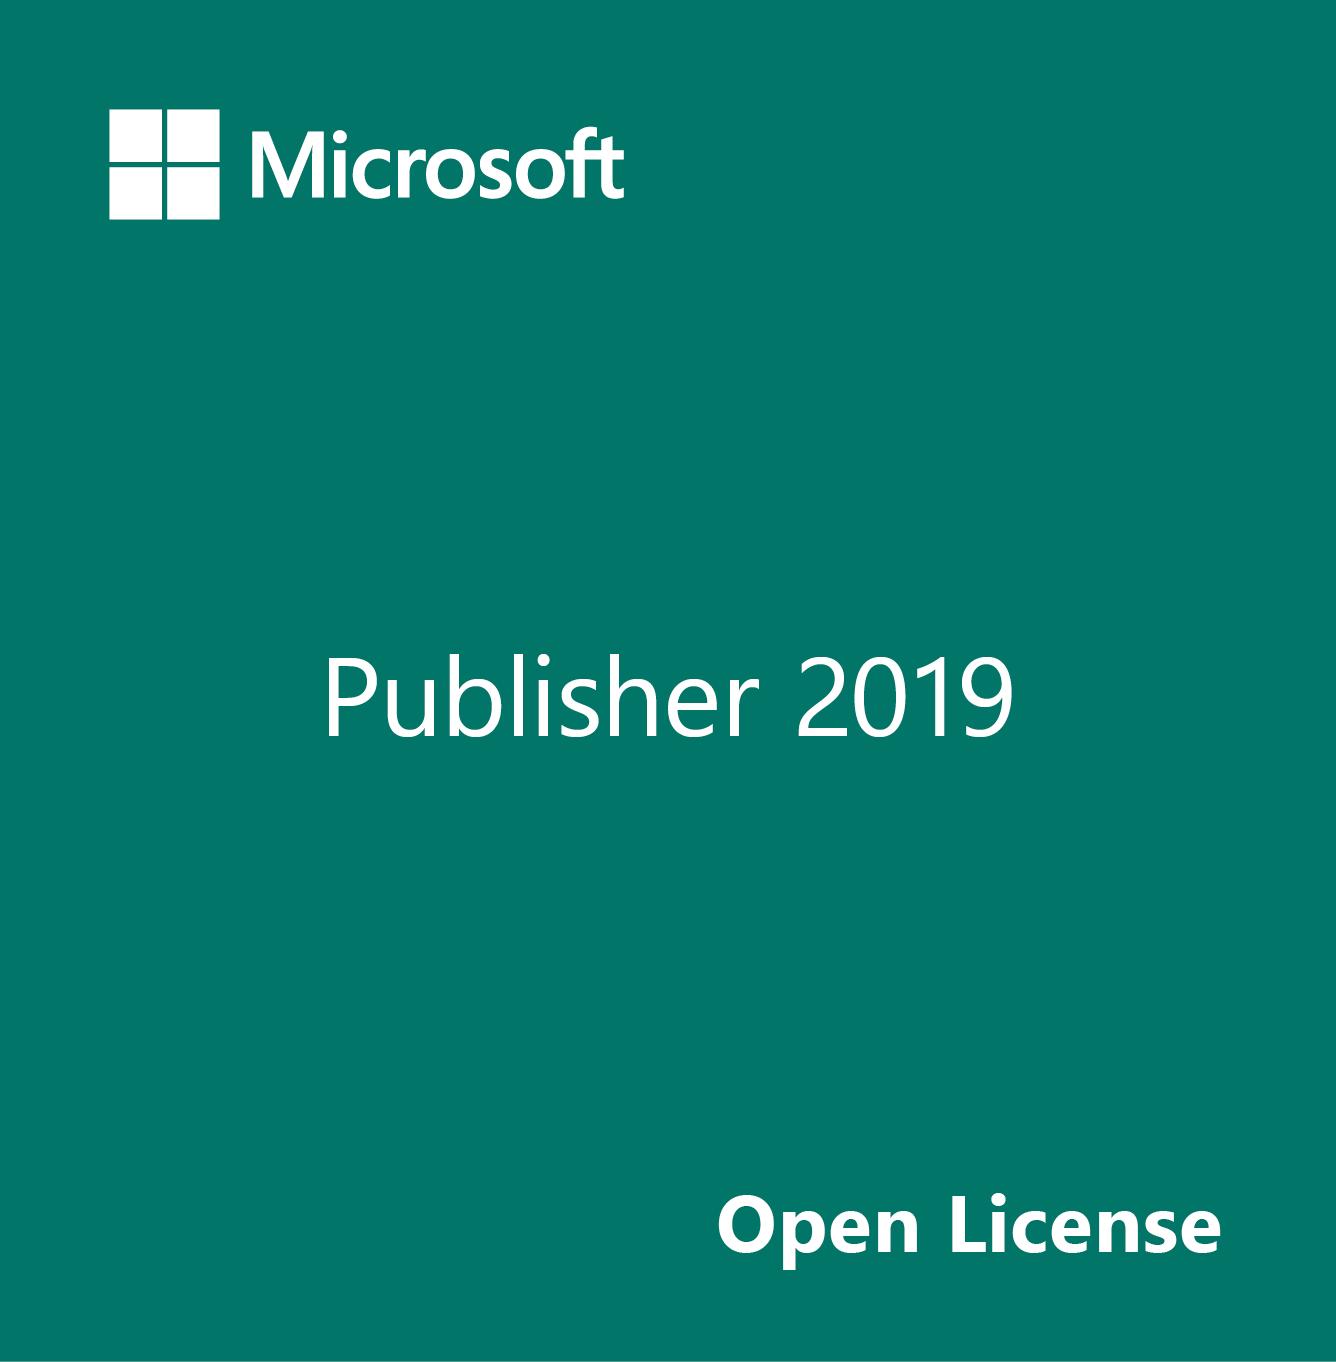 Microsoft Publisher 2019 Open License Enespa Software Shop